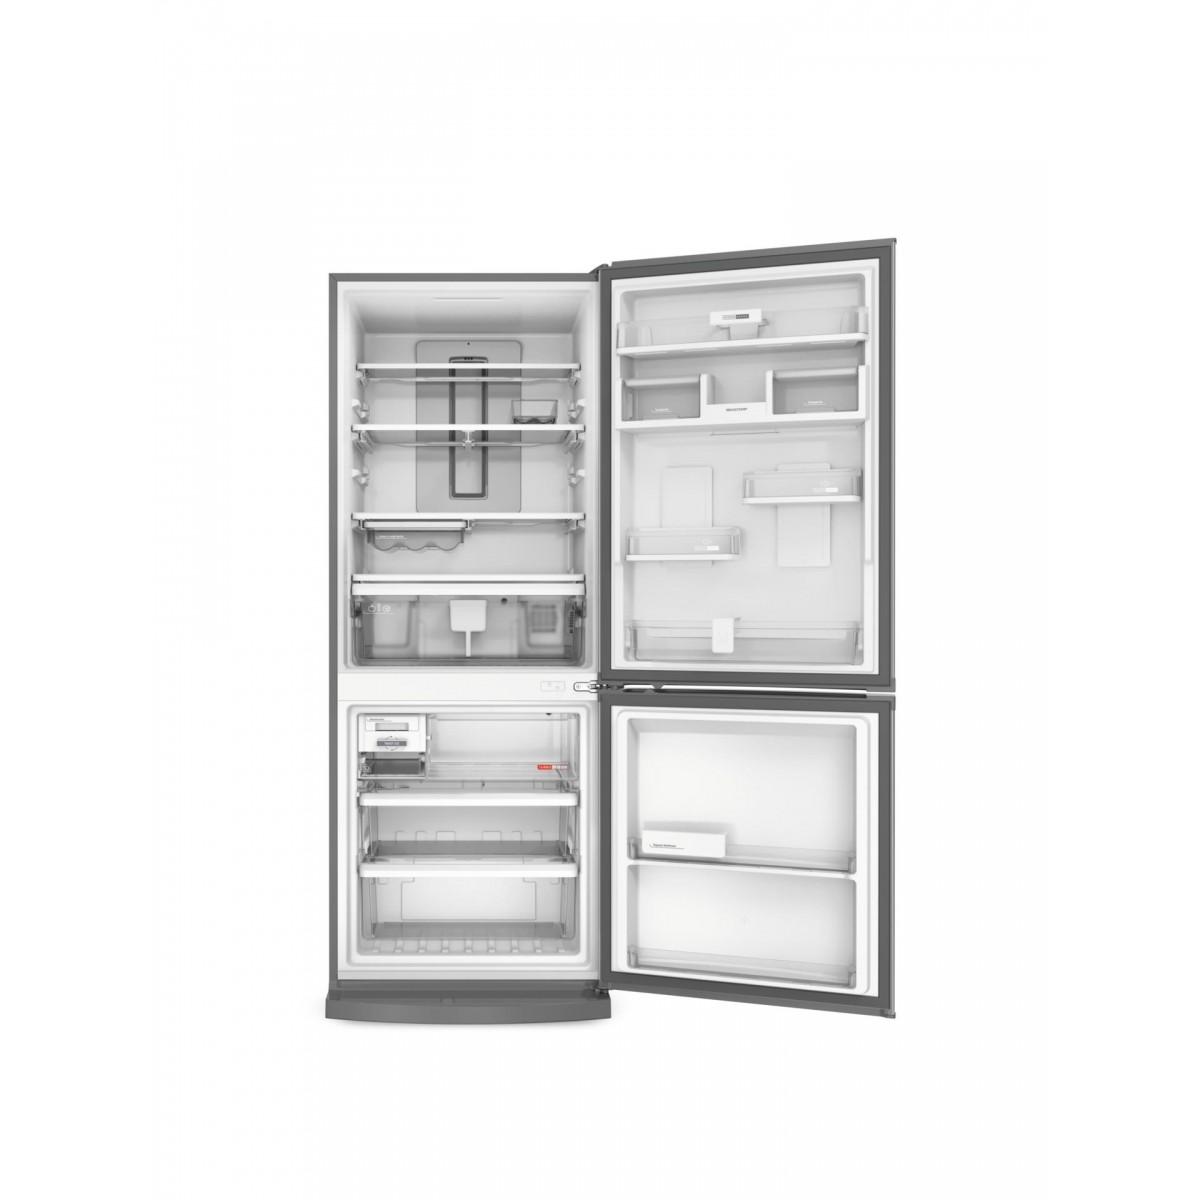 Geladeira Brastemp Inverse Frost Free 478 litros - BRE58AK